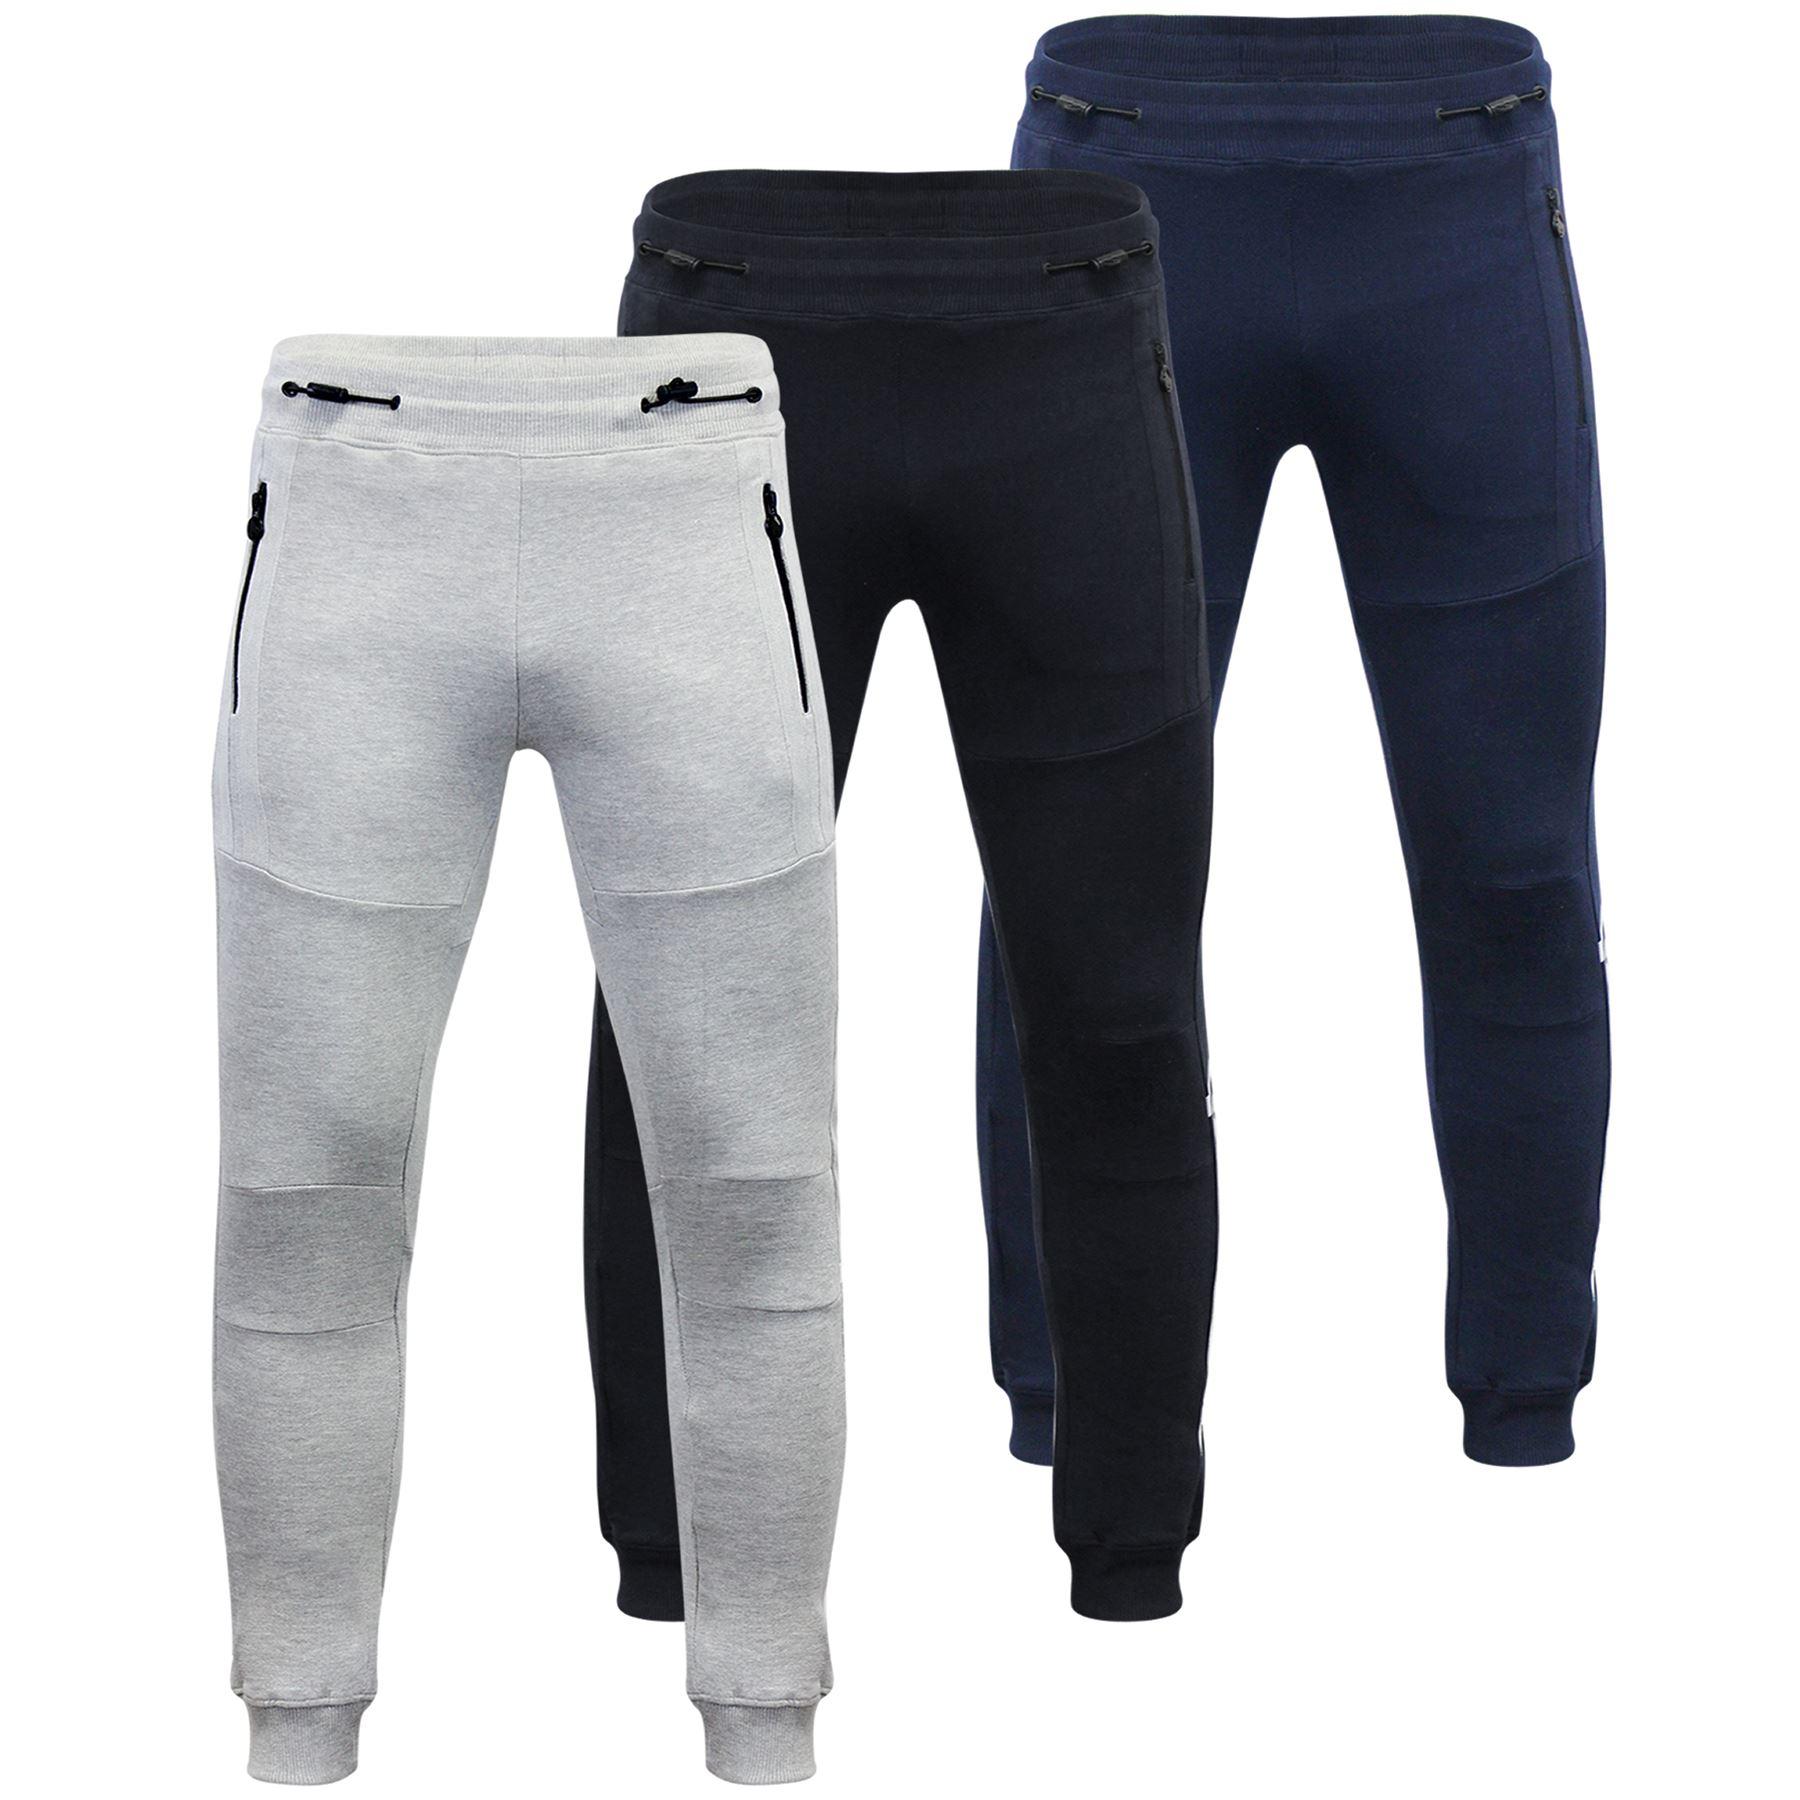 Mens Joggers Money Sig Strip Jog Skinny Slim Casual Jogging Gym Pants